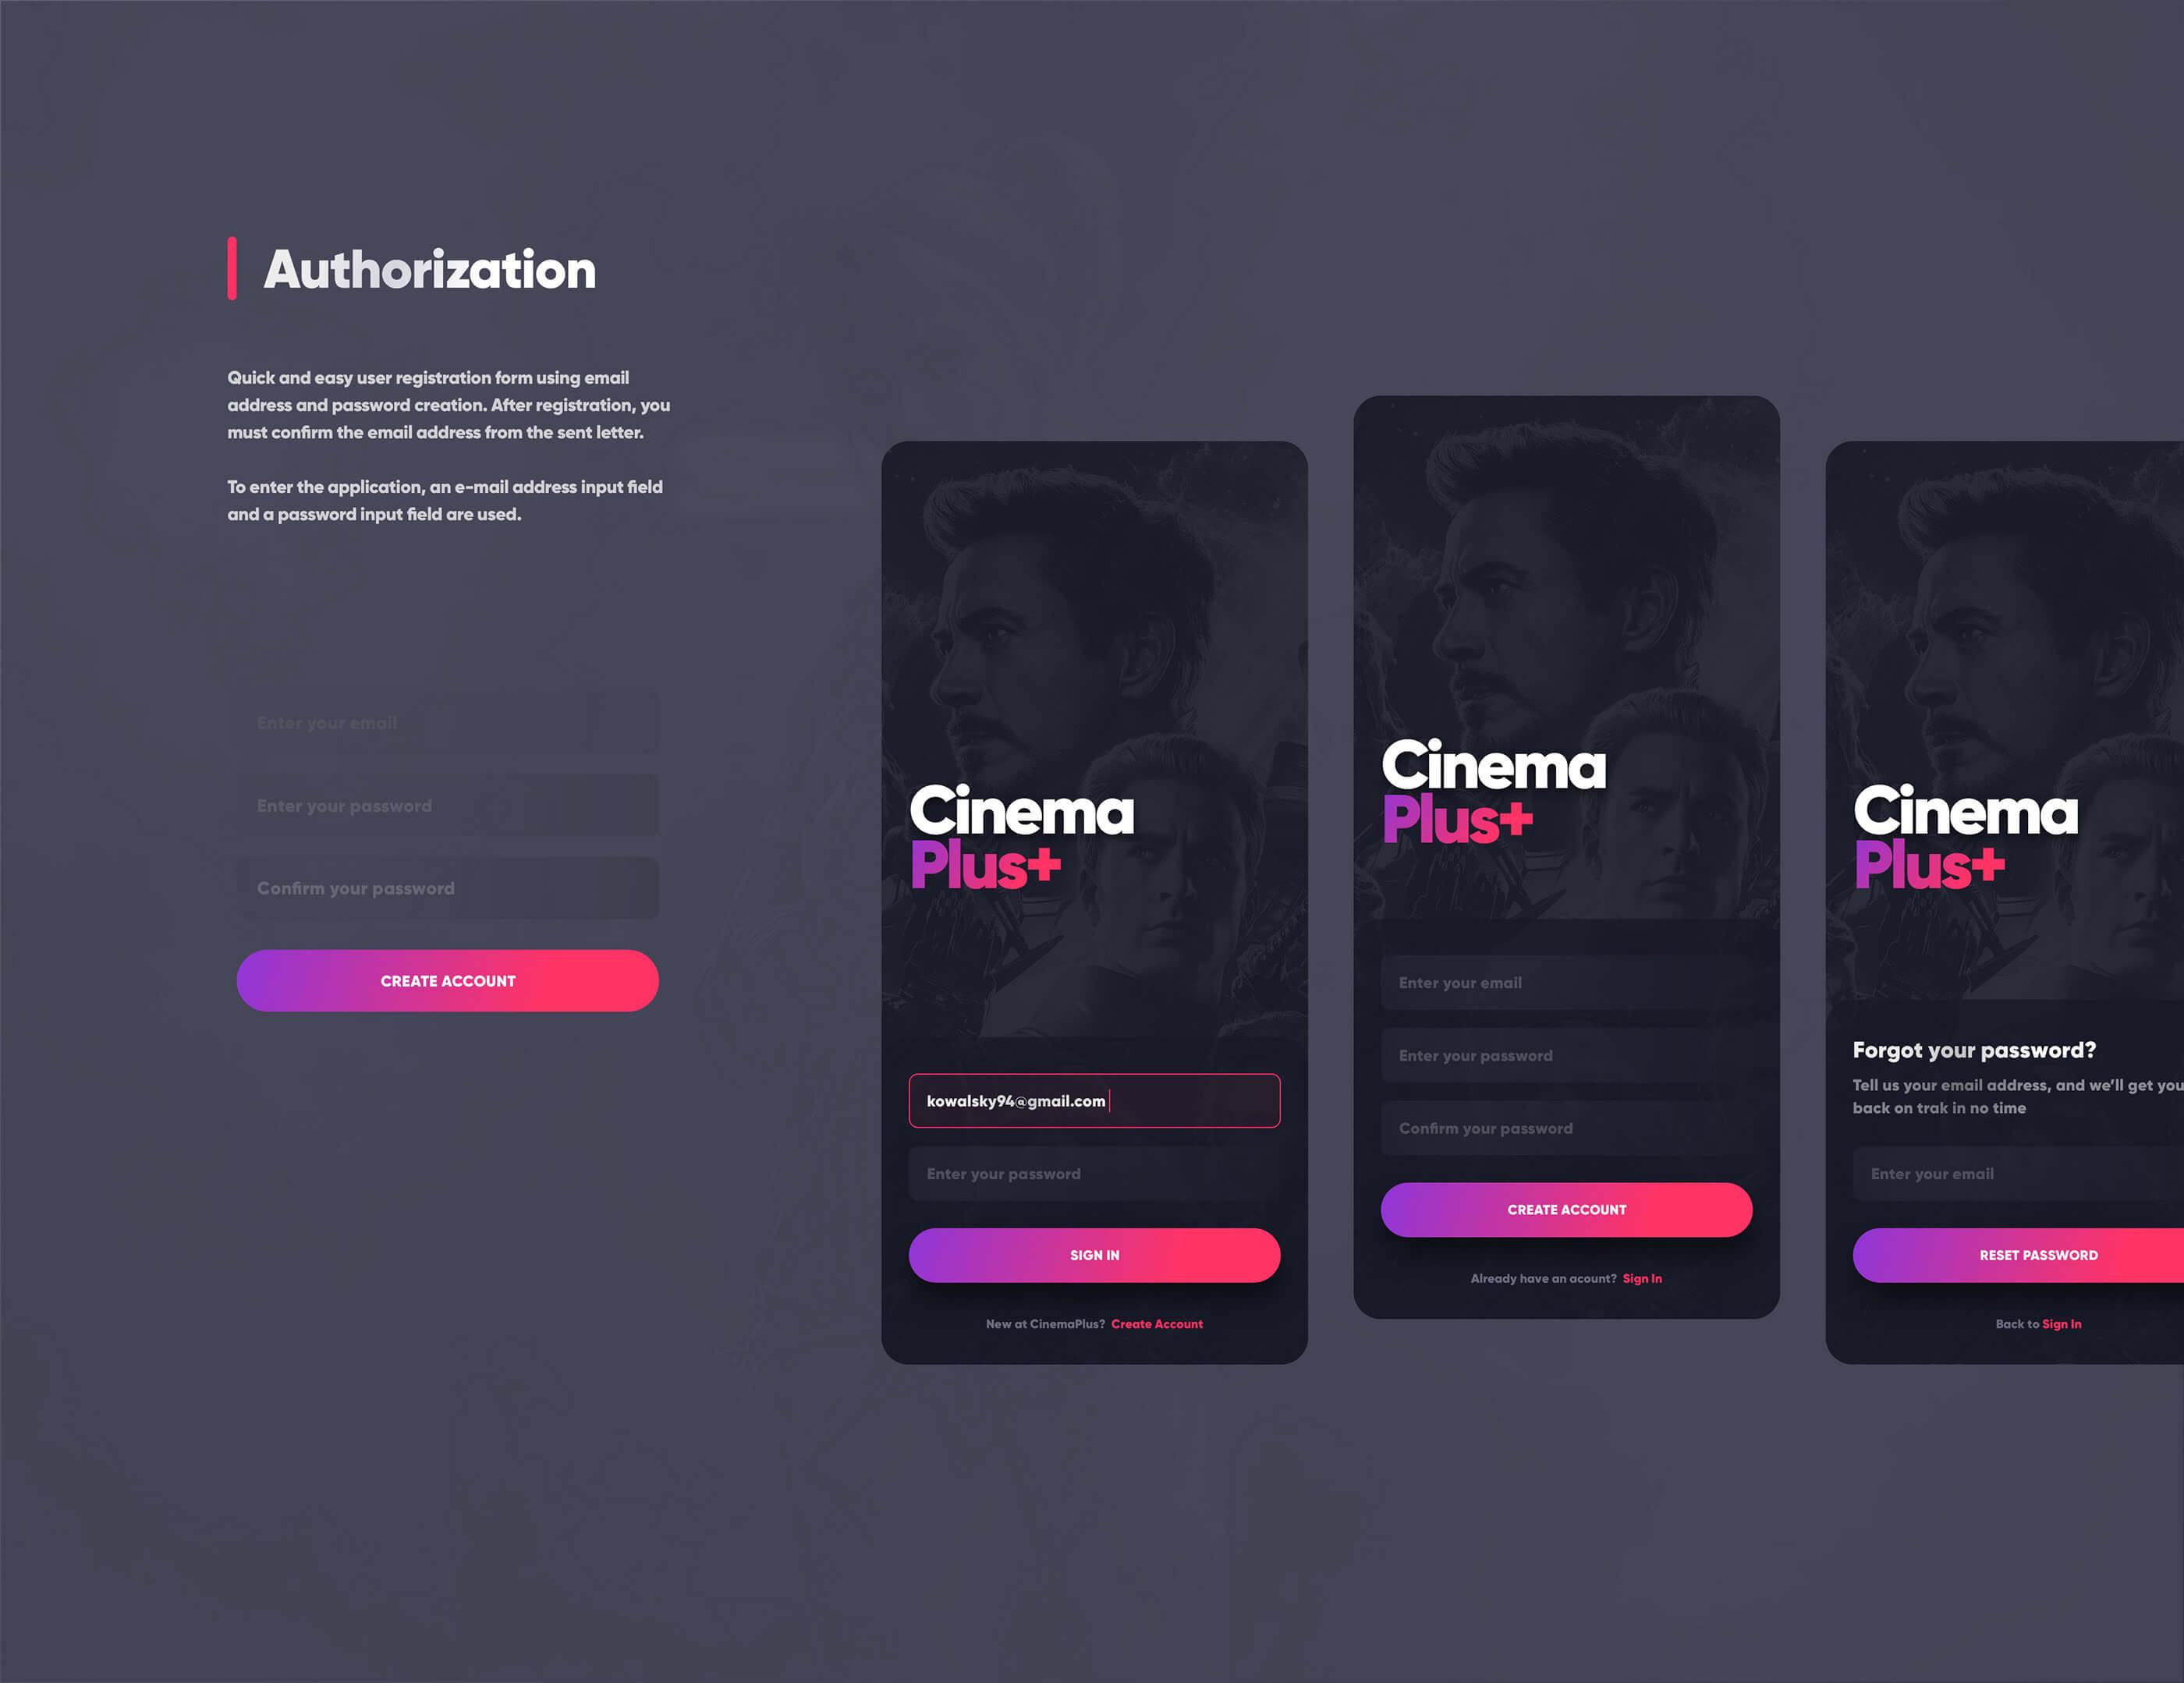 Cinema Plus presentation image